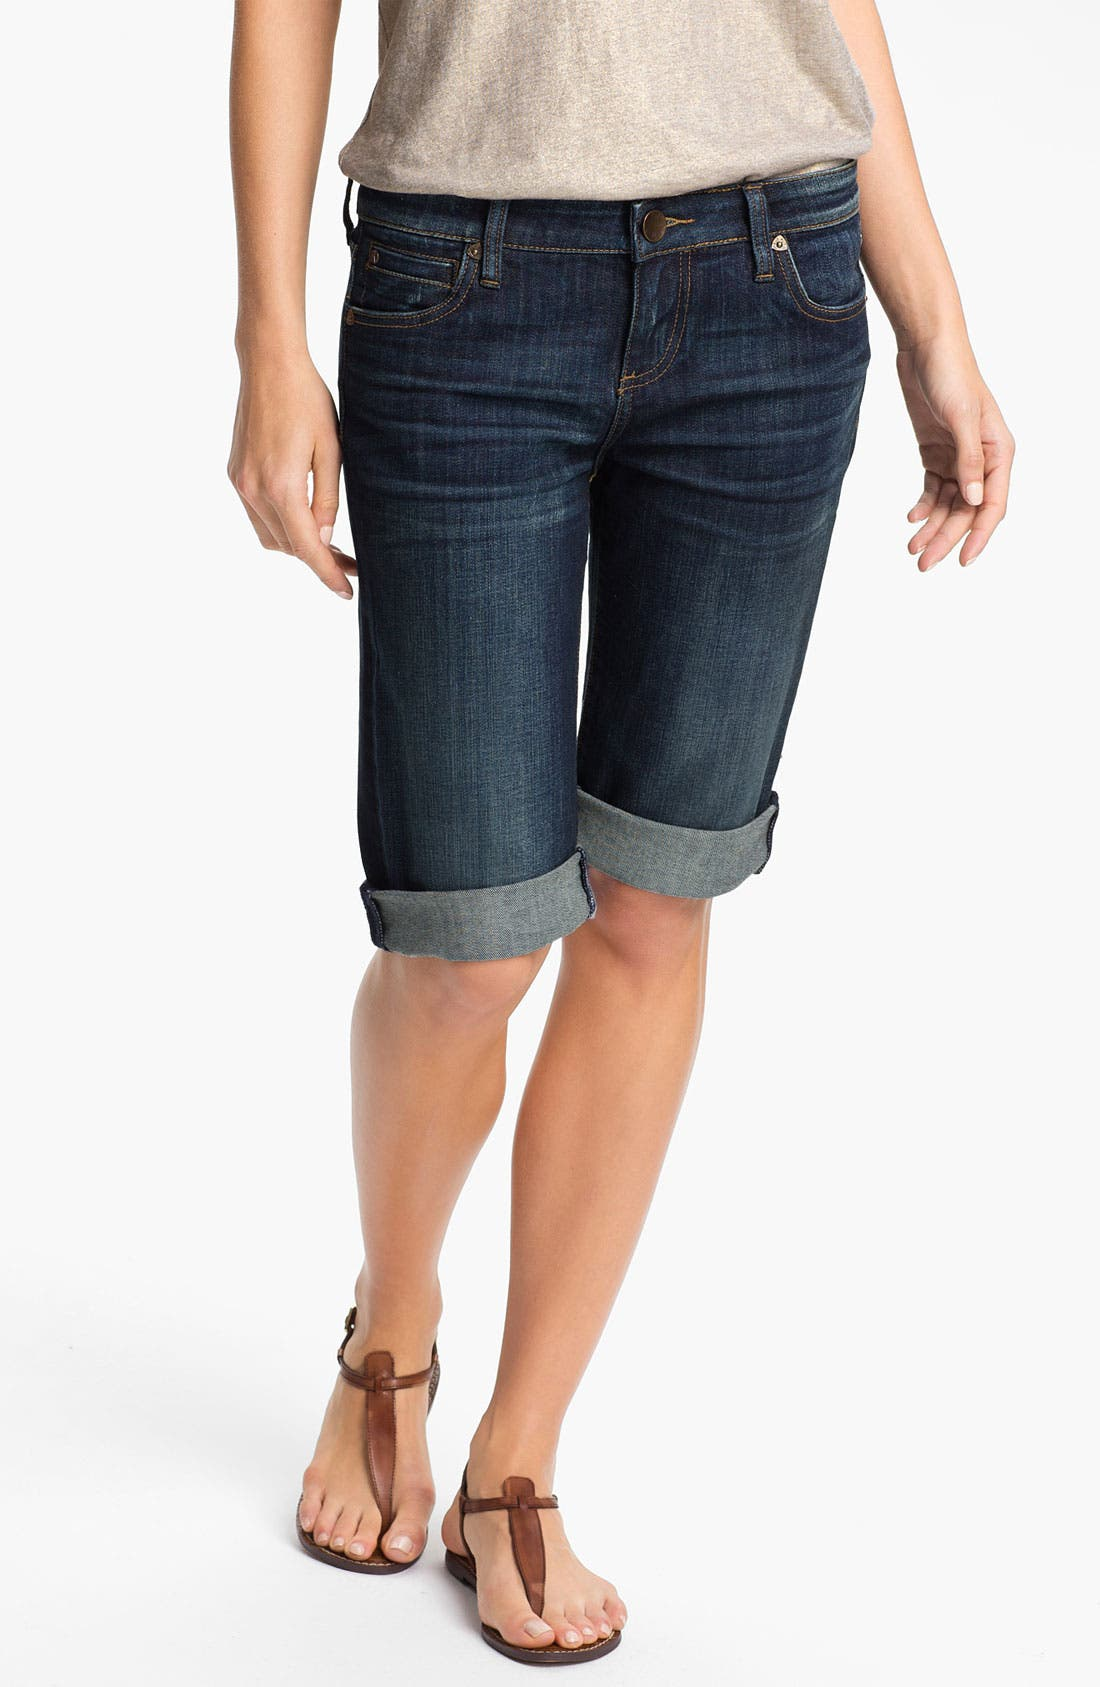 Alternate Image 1 Selected - KUT from the Kloth Denim Bermuda Shorts